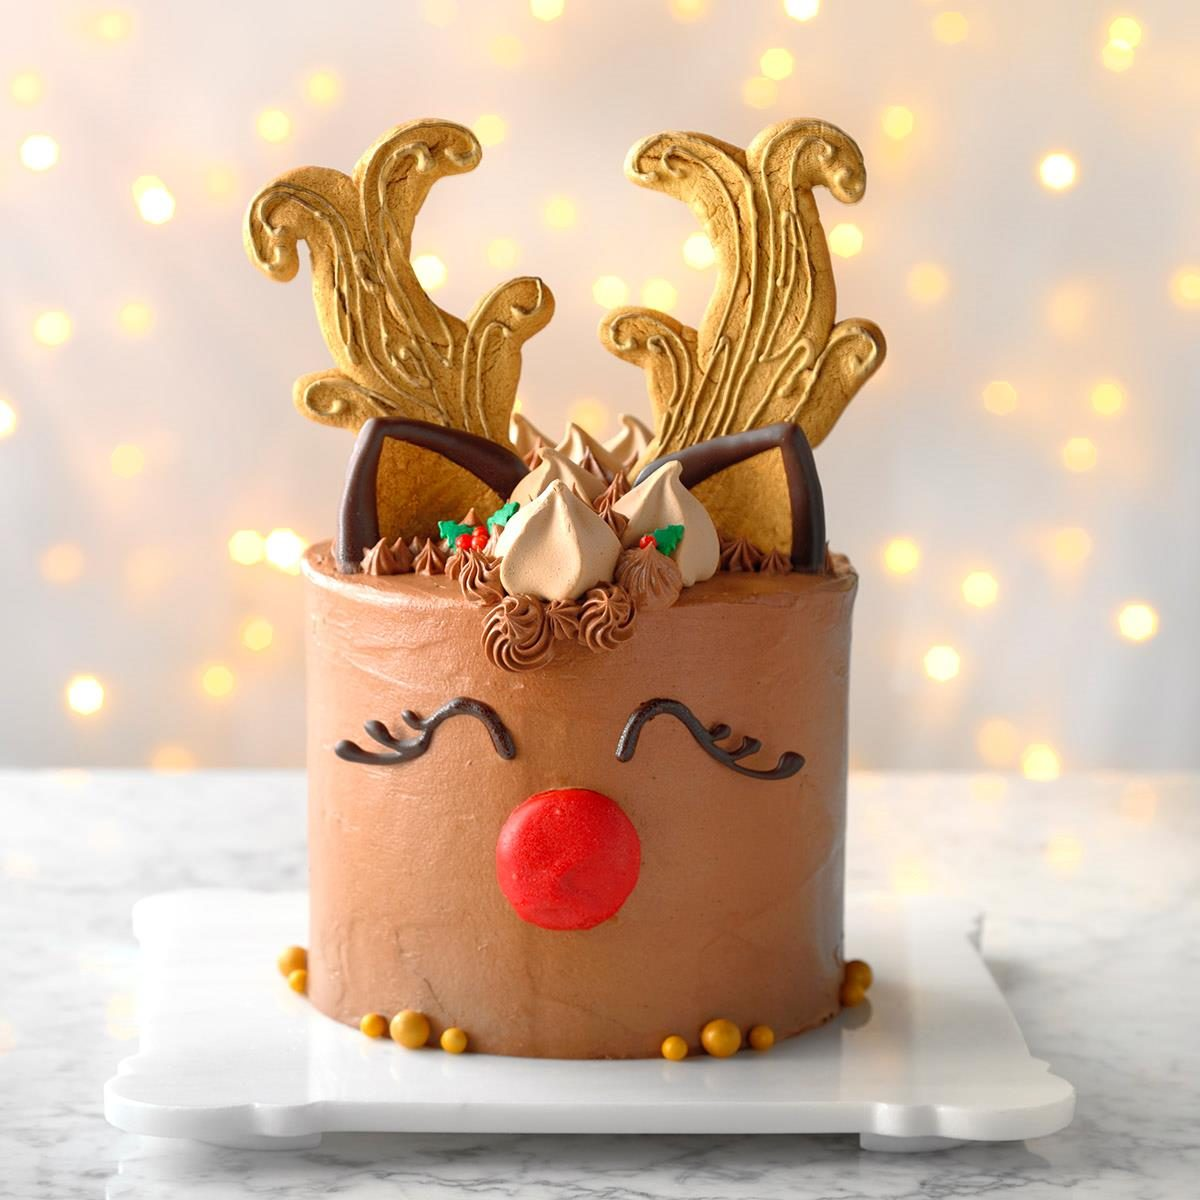 Iowa: Reindeer Cake